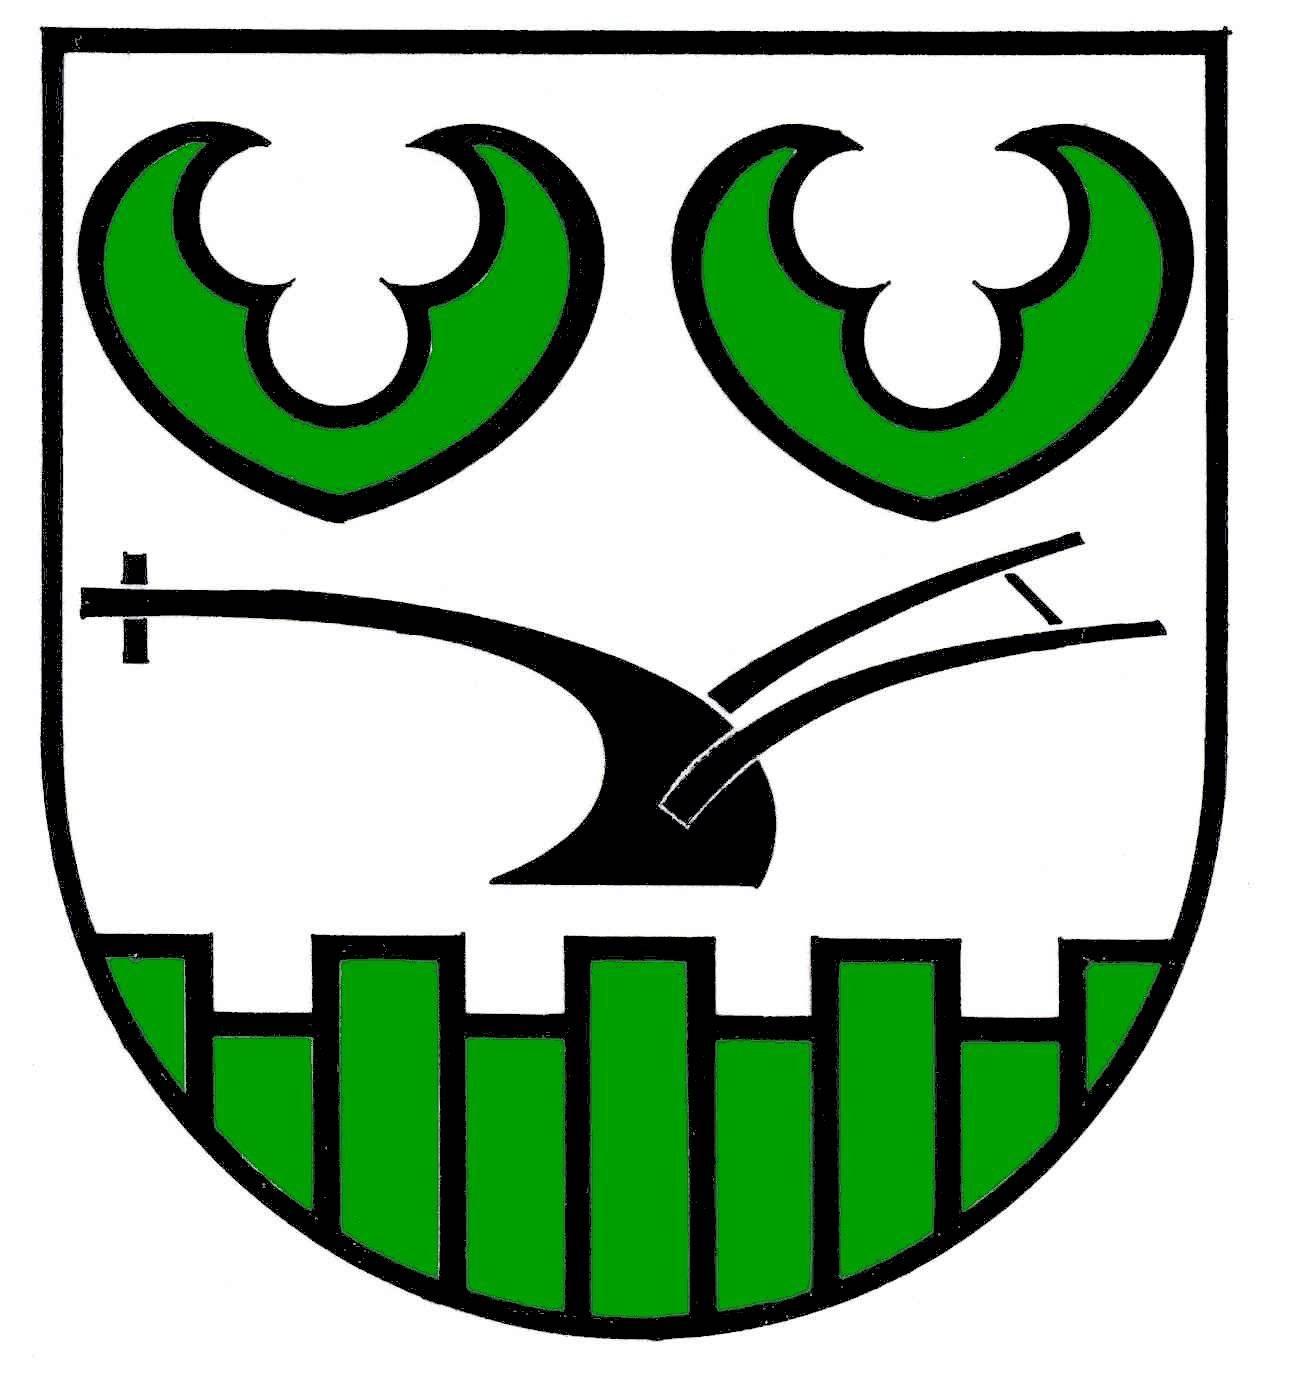 Wappen GemeindeBelau, Kreis Plön